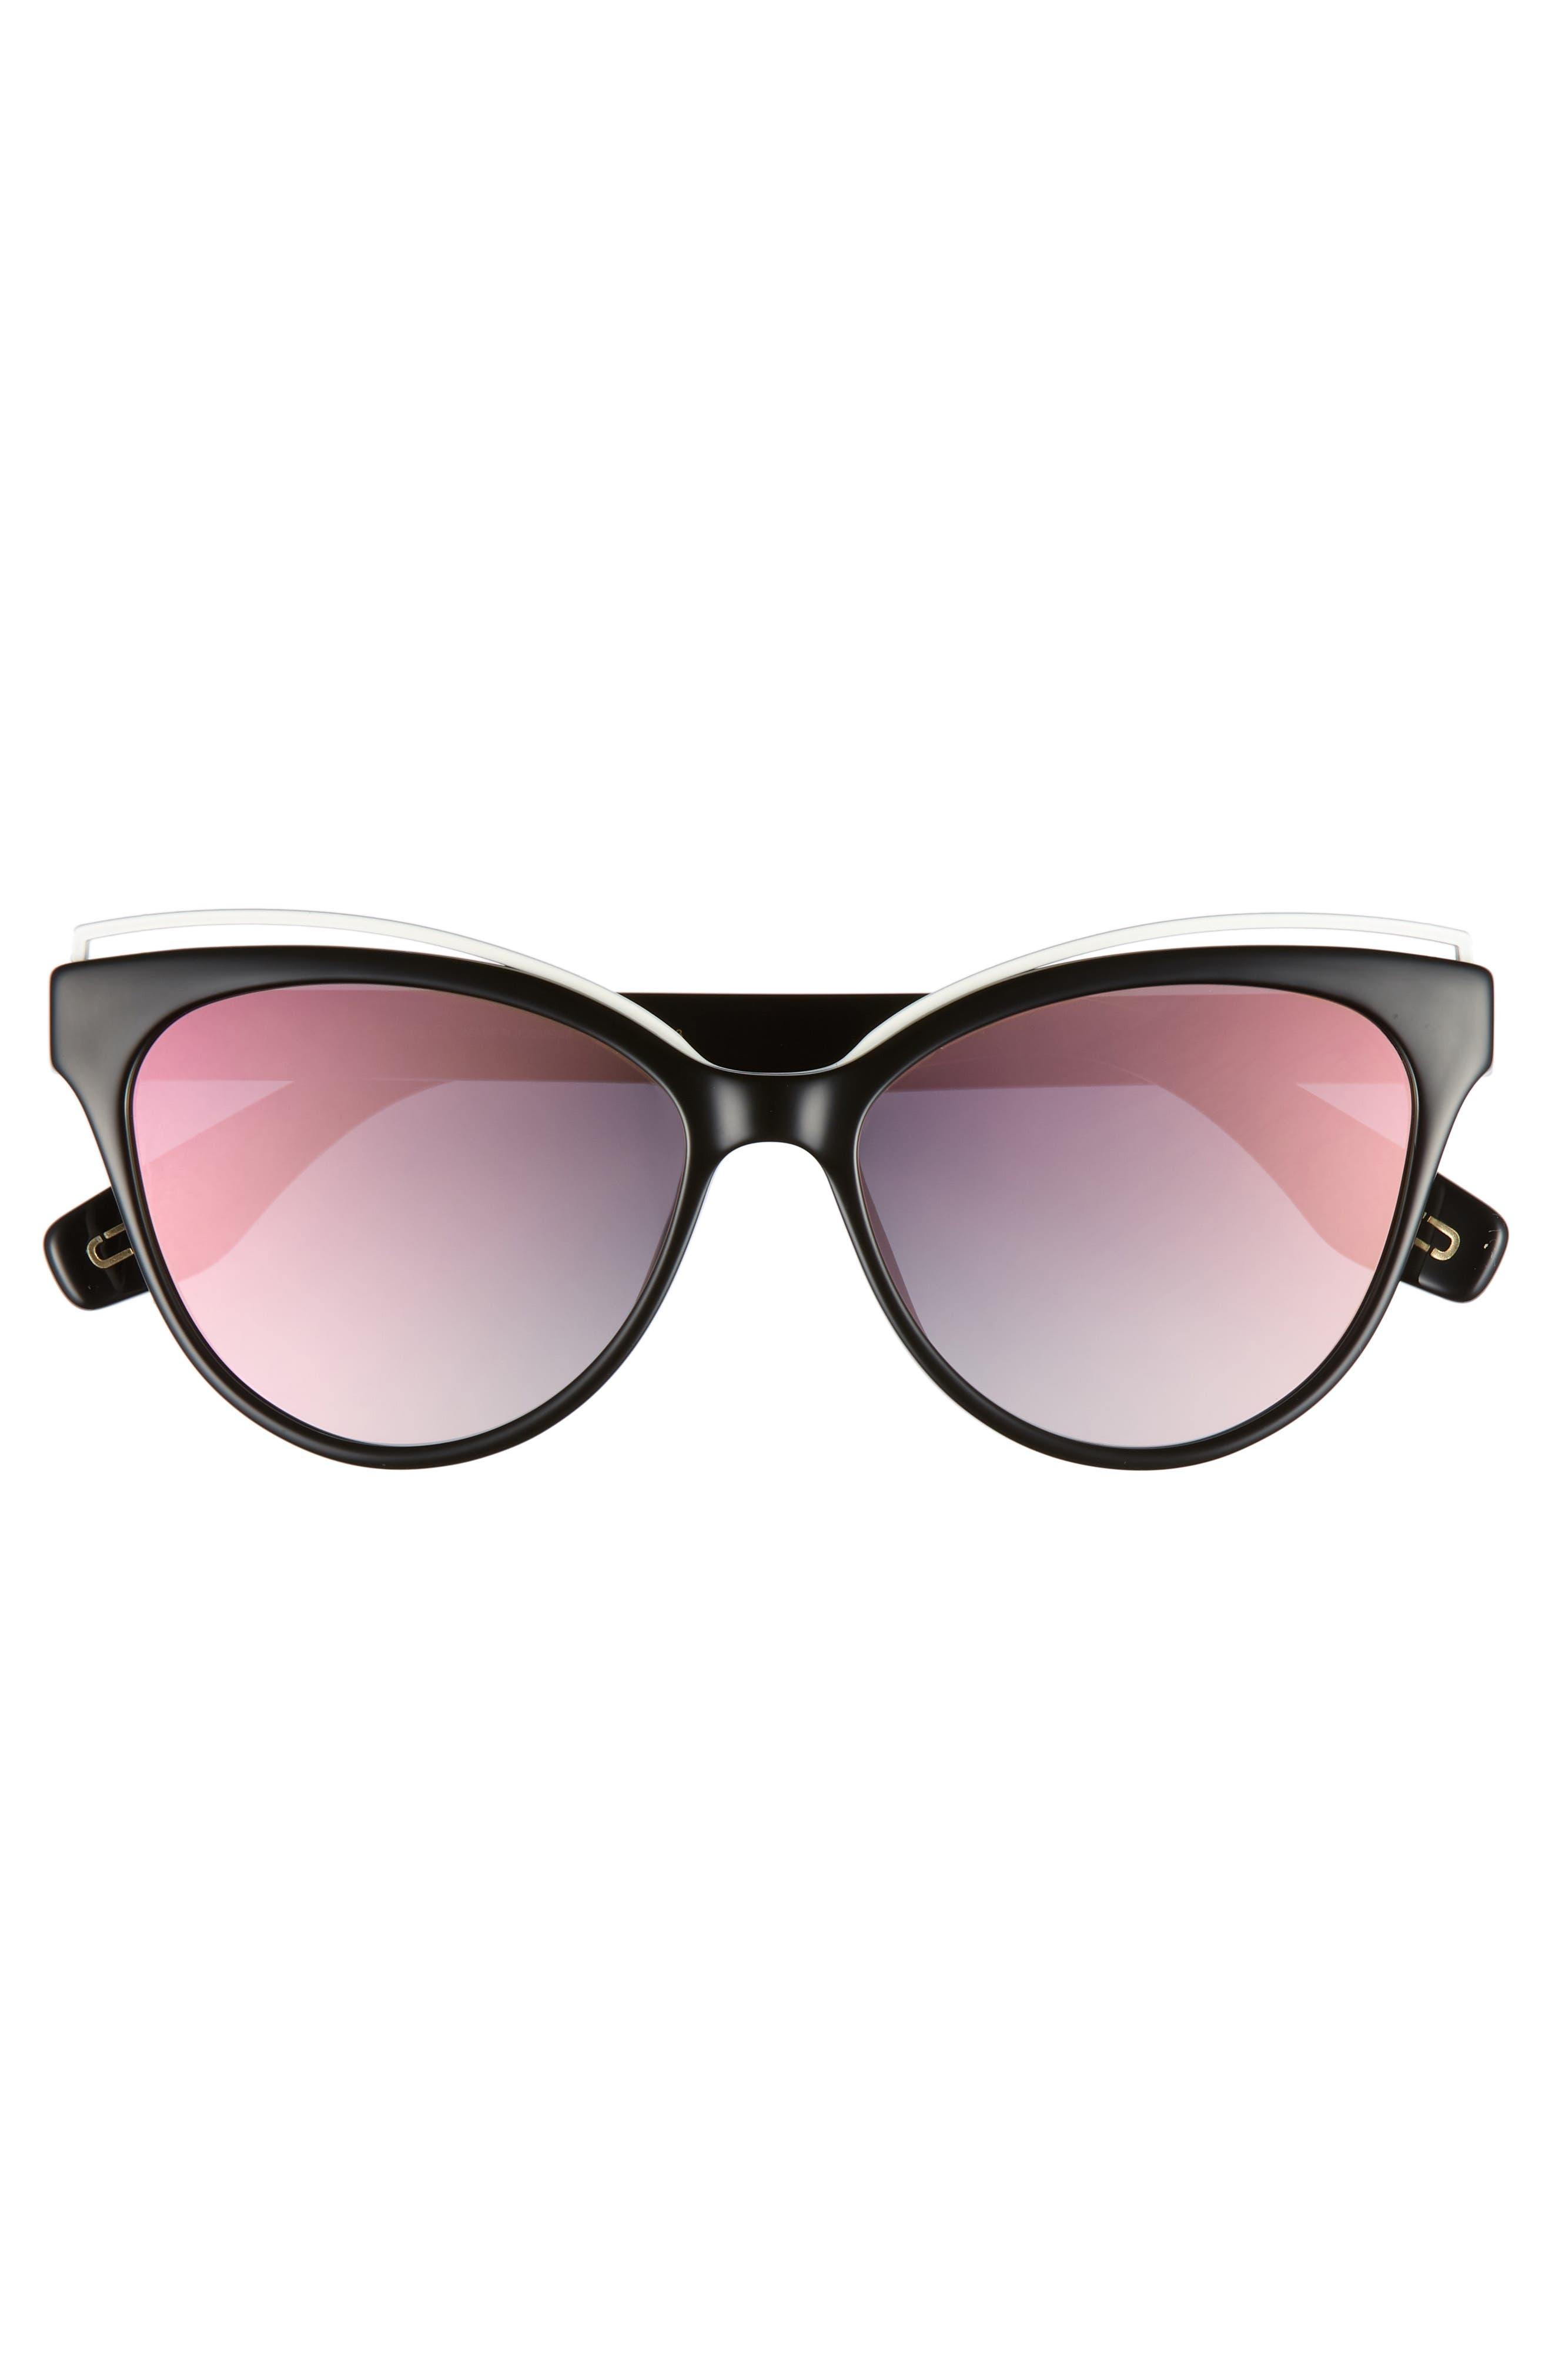 55mm Cat Eye Sunglasses,                             Alternate thumbnail 3, color,                             BLACK/ PINK